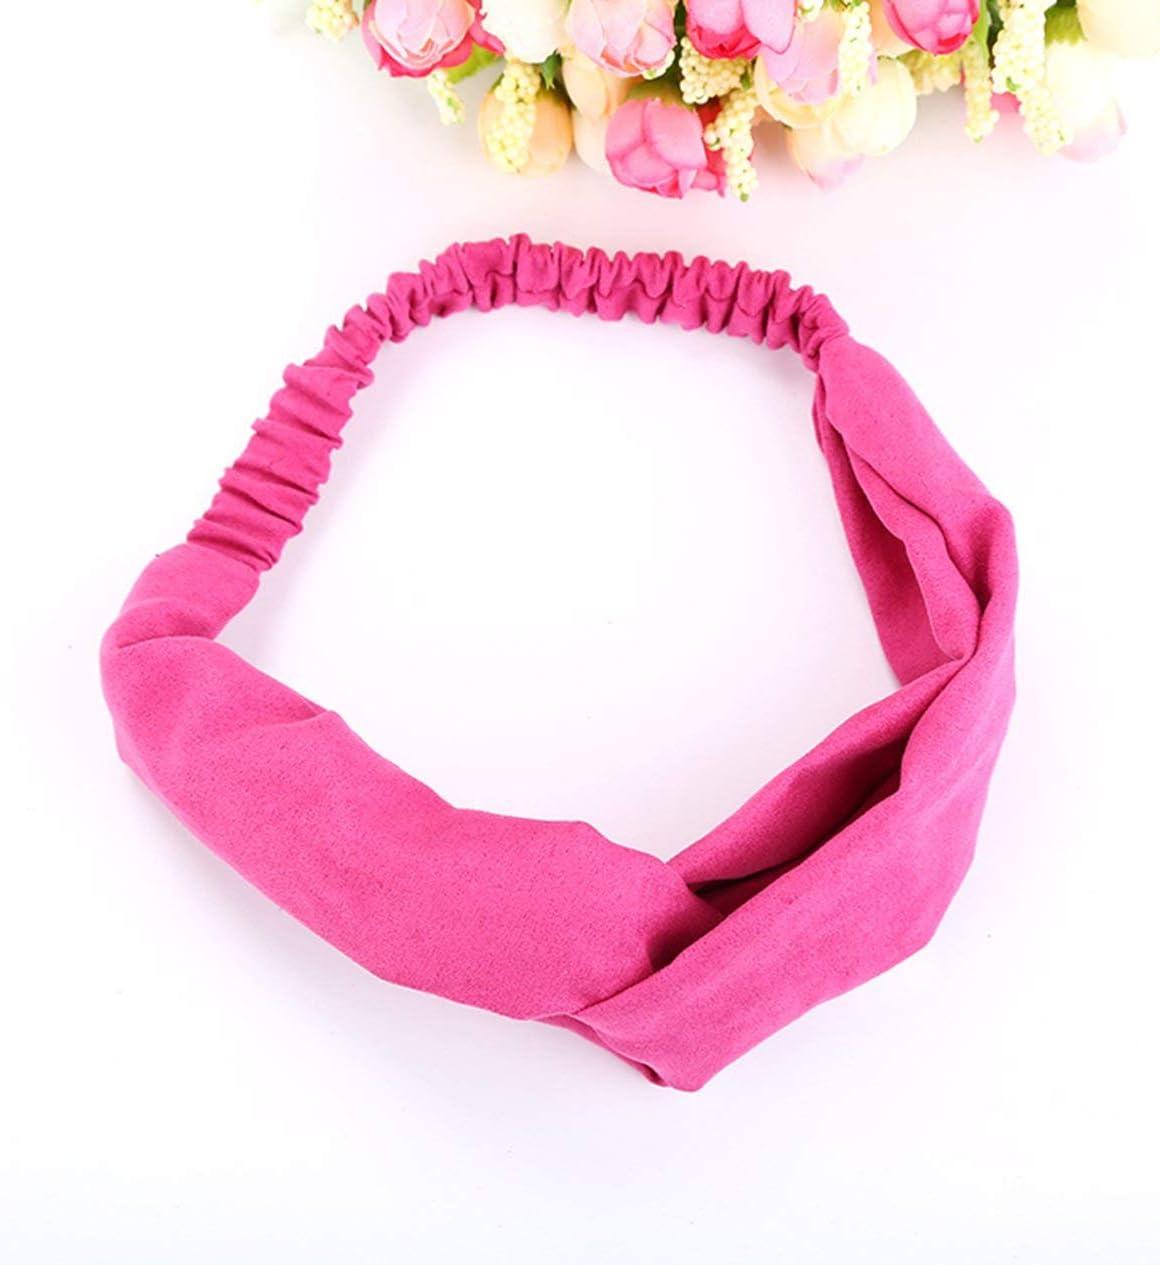 Women Girls Headband Headwear Multifunction Magic Scarf Head Wrap Sport Sweatband Workout Yoga for Sport /& Casual FD004